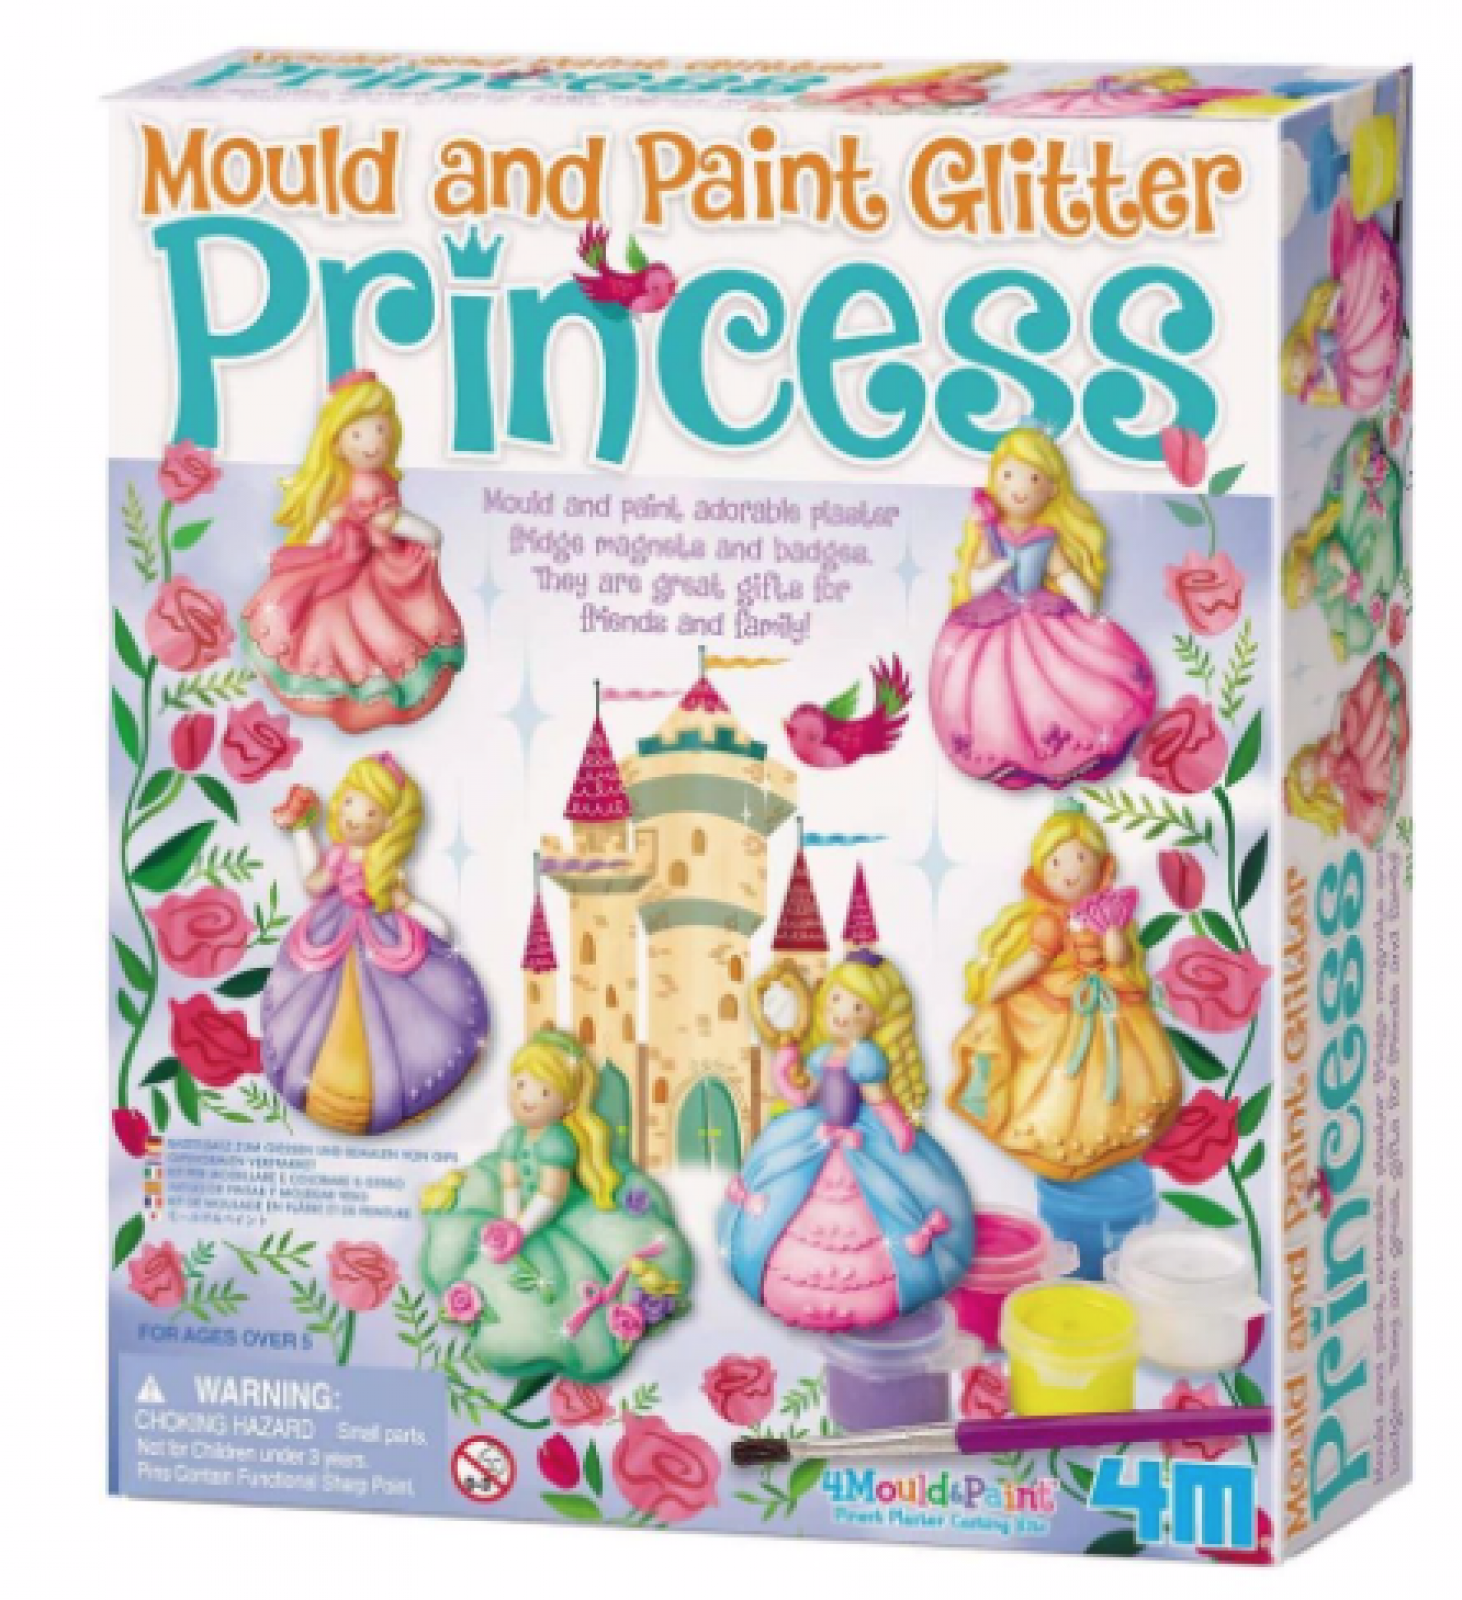 Mould & Paint Glitter Princess Art Kit 5+